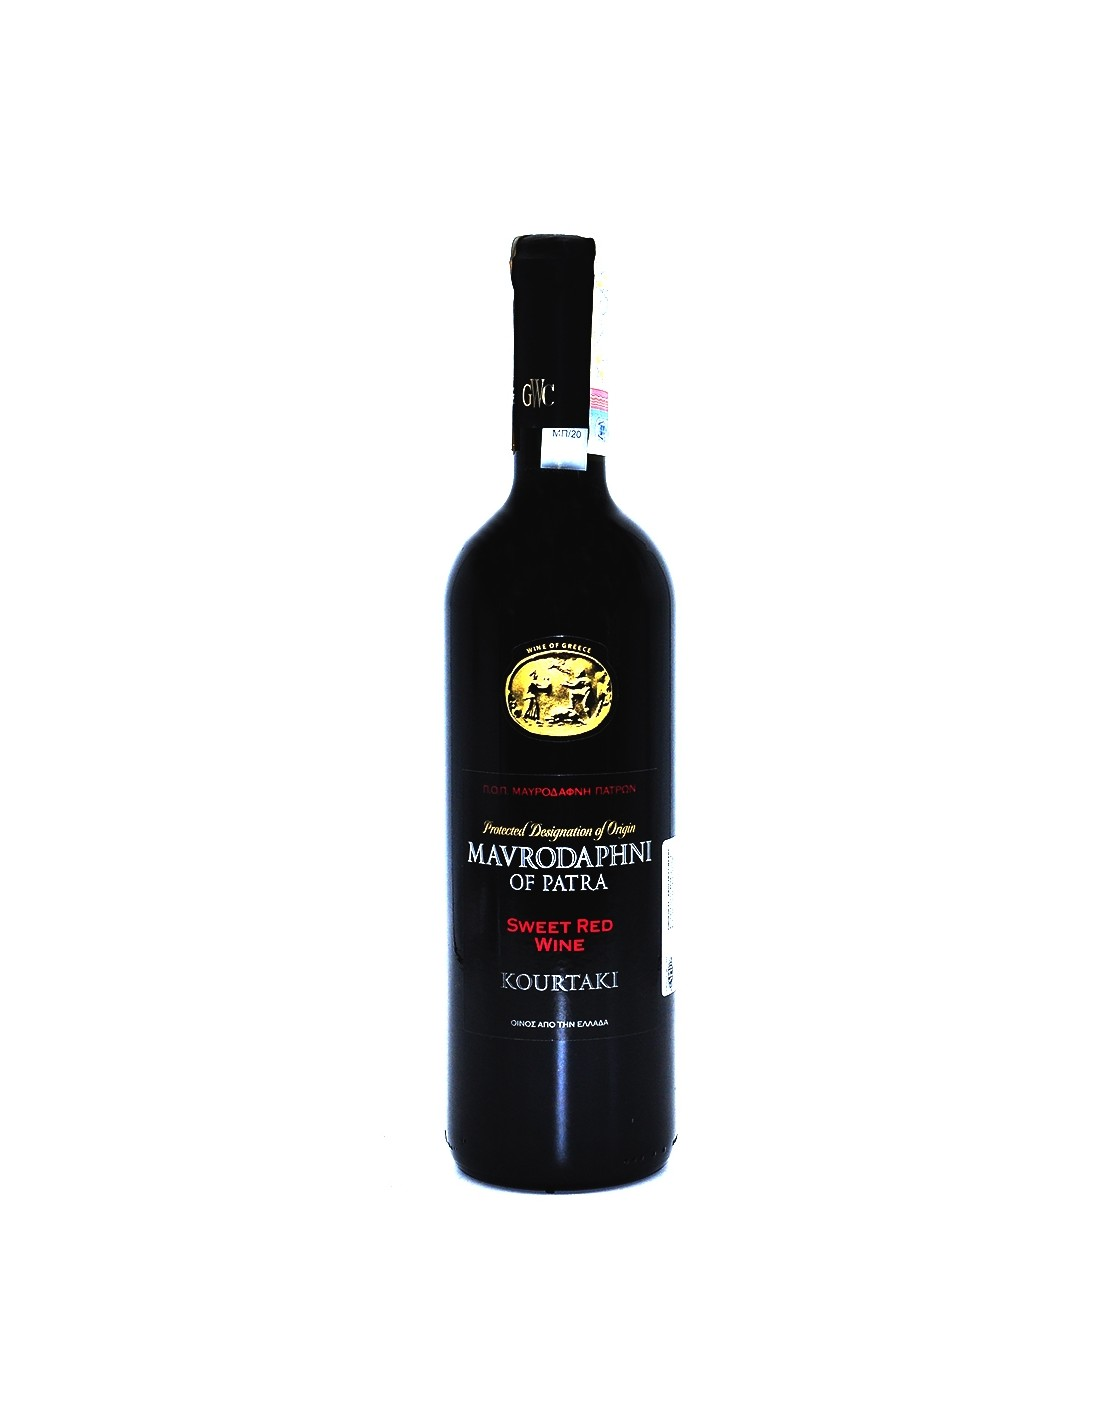 Vin rosu dulce, Korinthiaki Mavrodaphne of Patras , 0.75L, 15% alc., Grecia